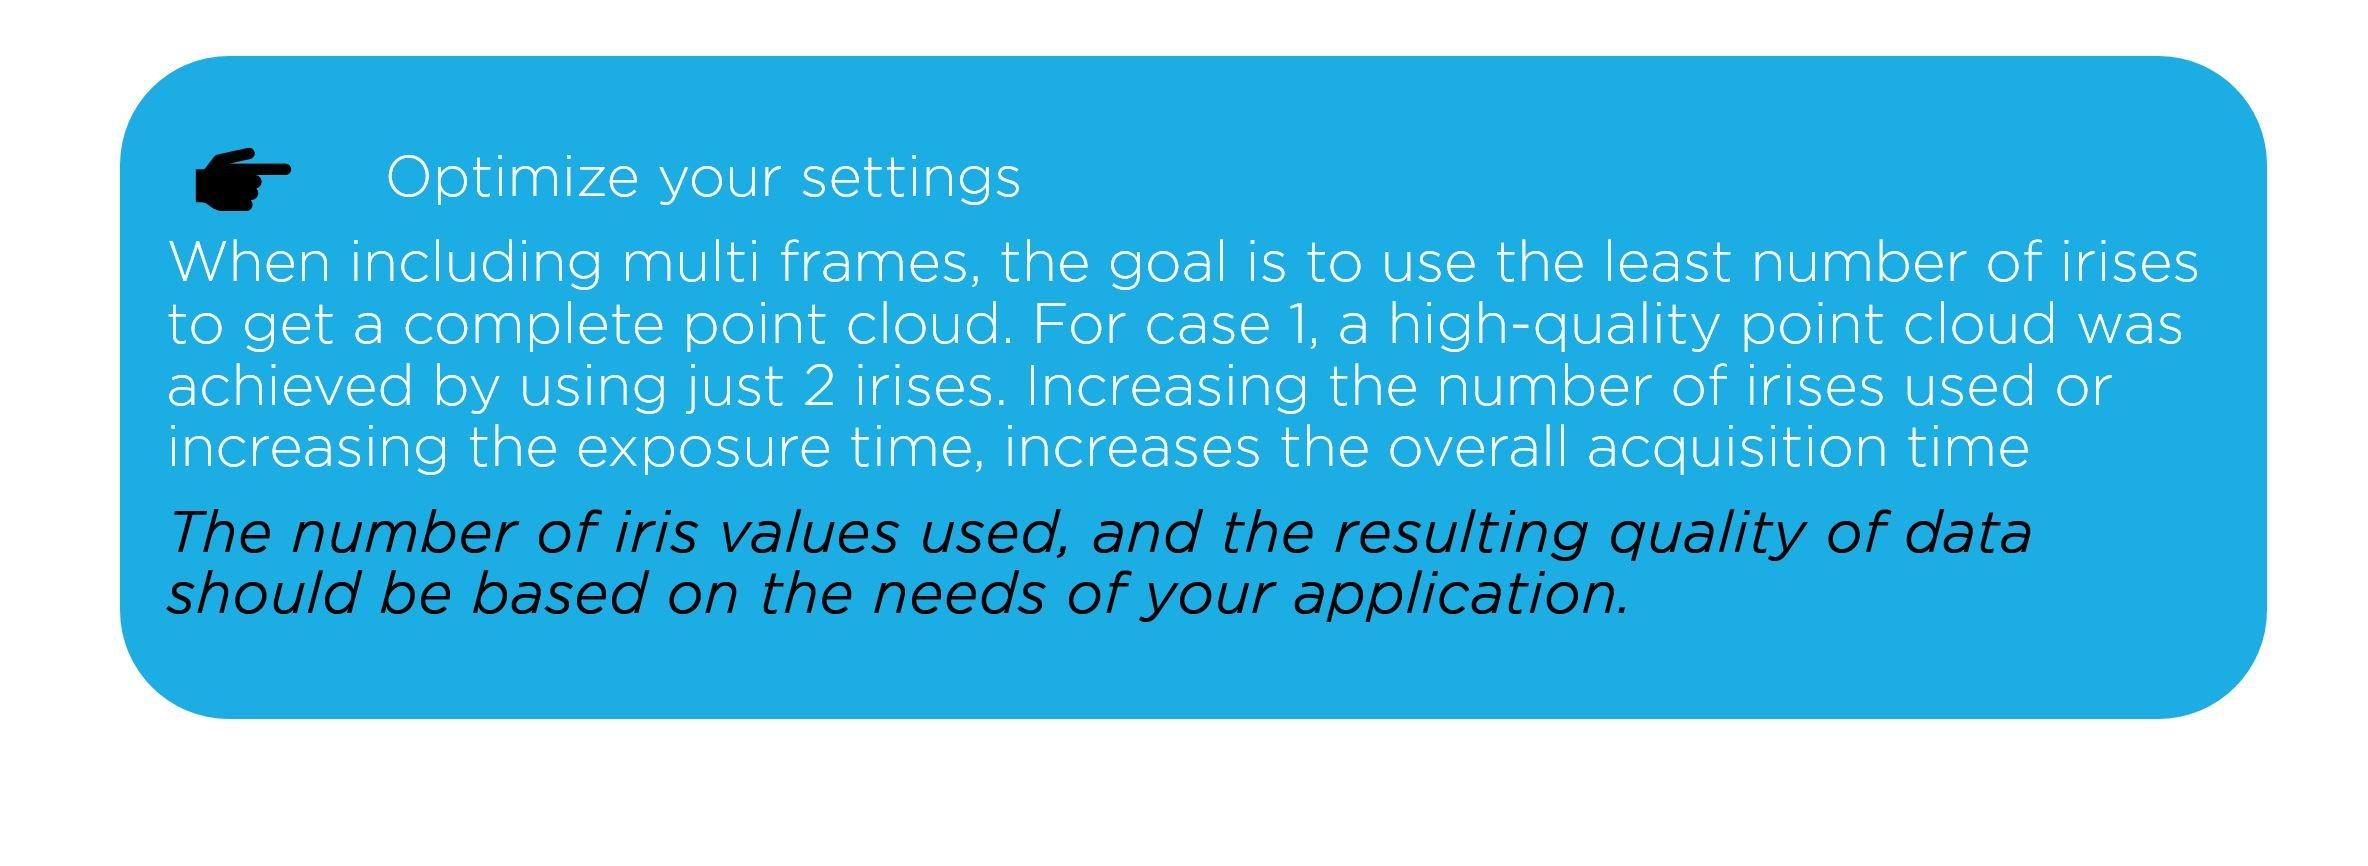 optimize ur settings